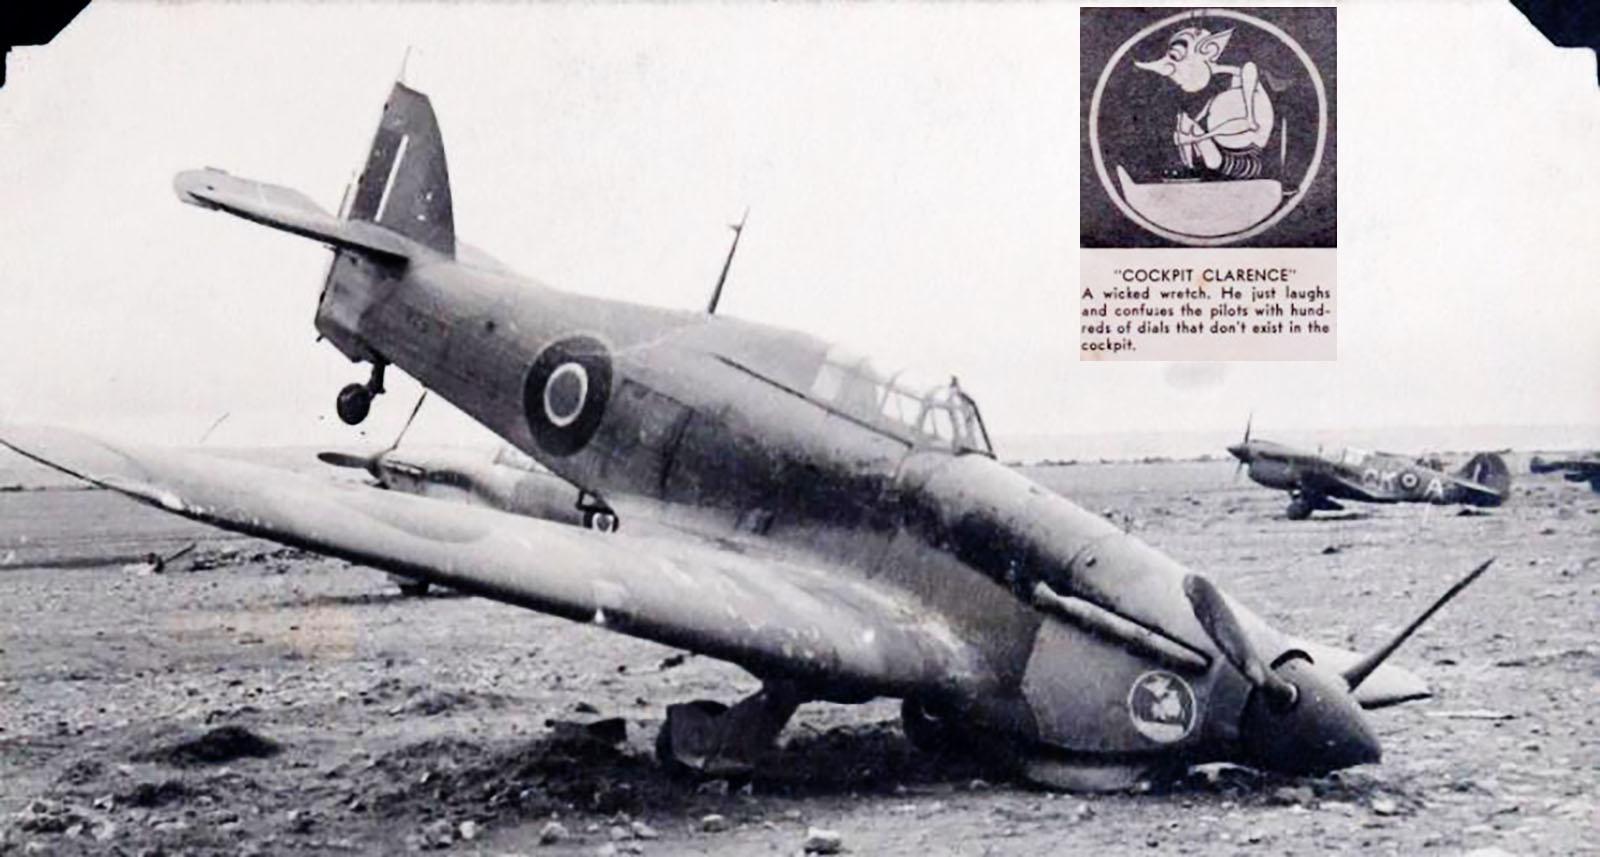 Hawker Hurricane IIb SAAF 40Sqn x23xx with Gremlin Cockpit Clearence North Africa 1942 43 01